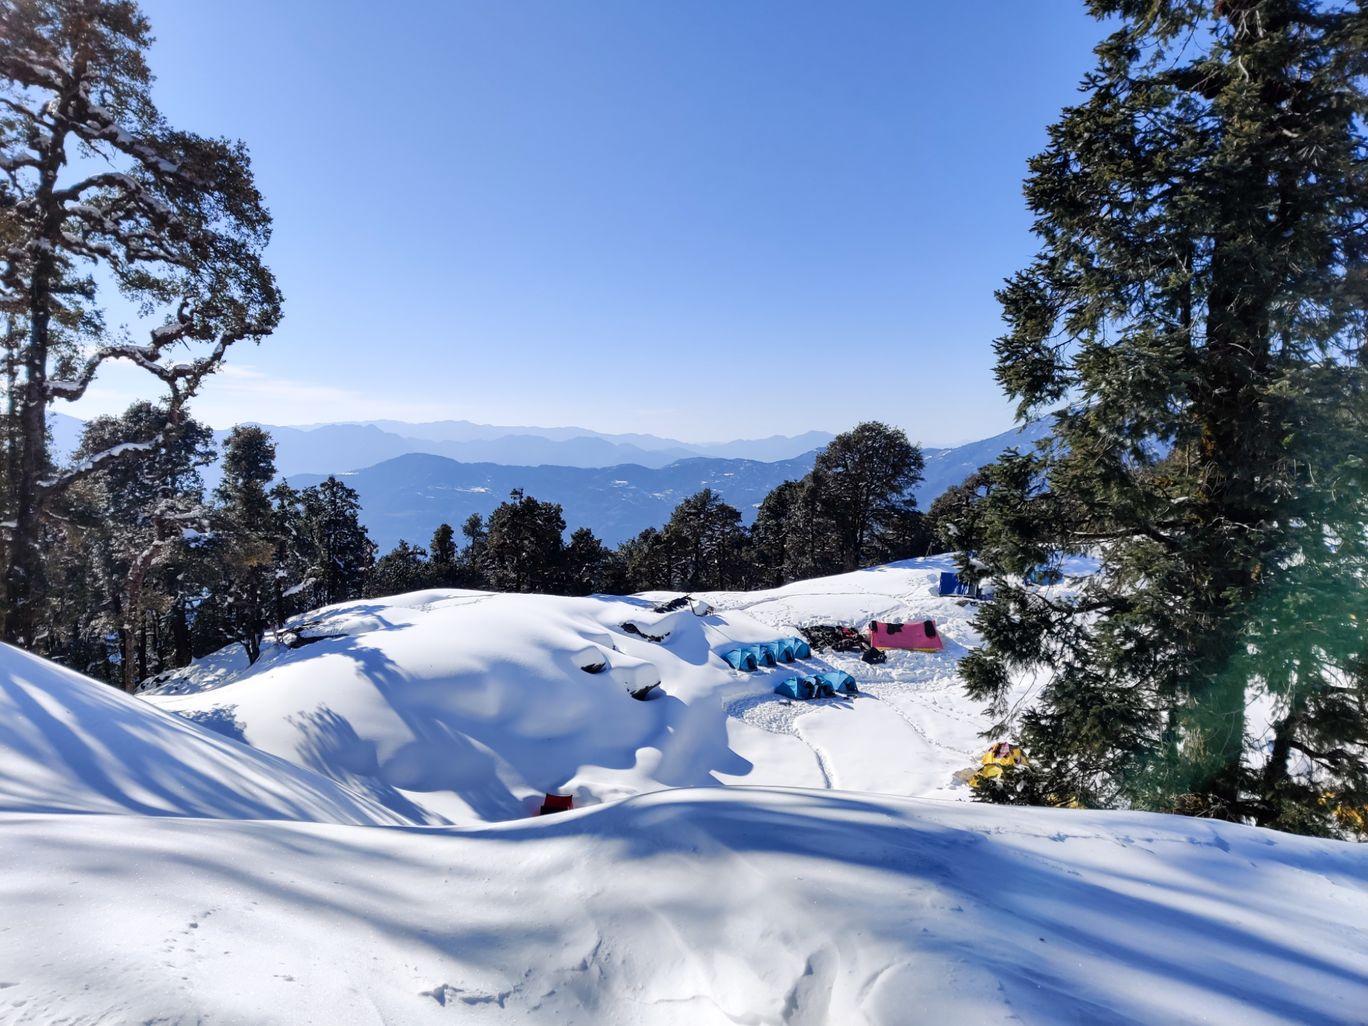 Photo of Bekaltal Camping Site By Meet Shah